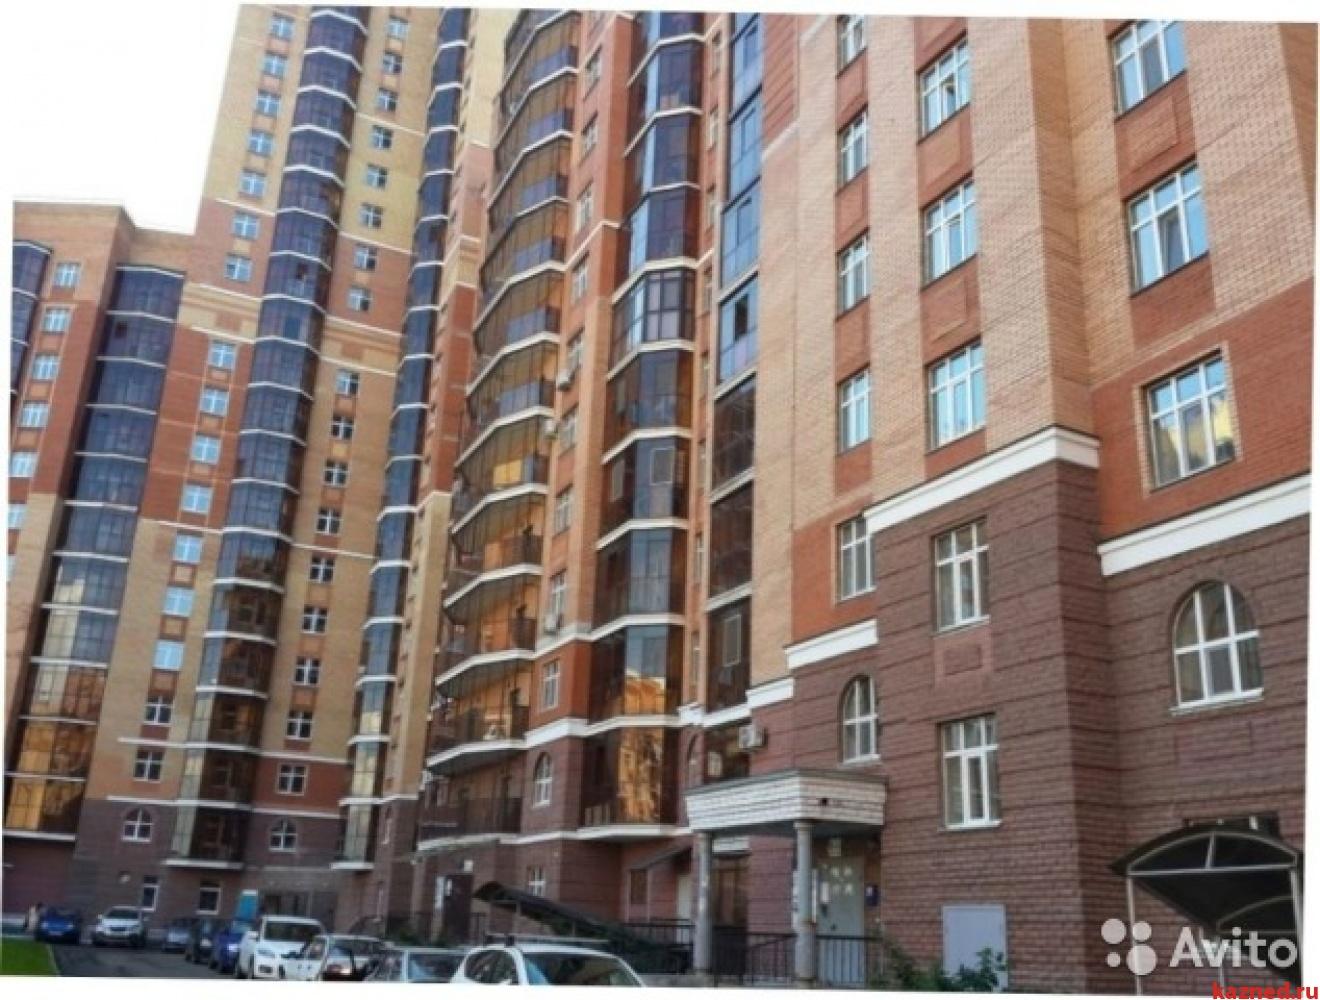 Продажа 1-к квартиры Баки Урманче, д.6, 45 м2  (миниатюра №1)